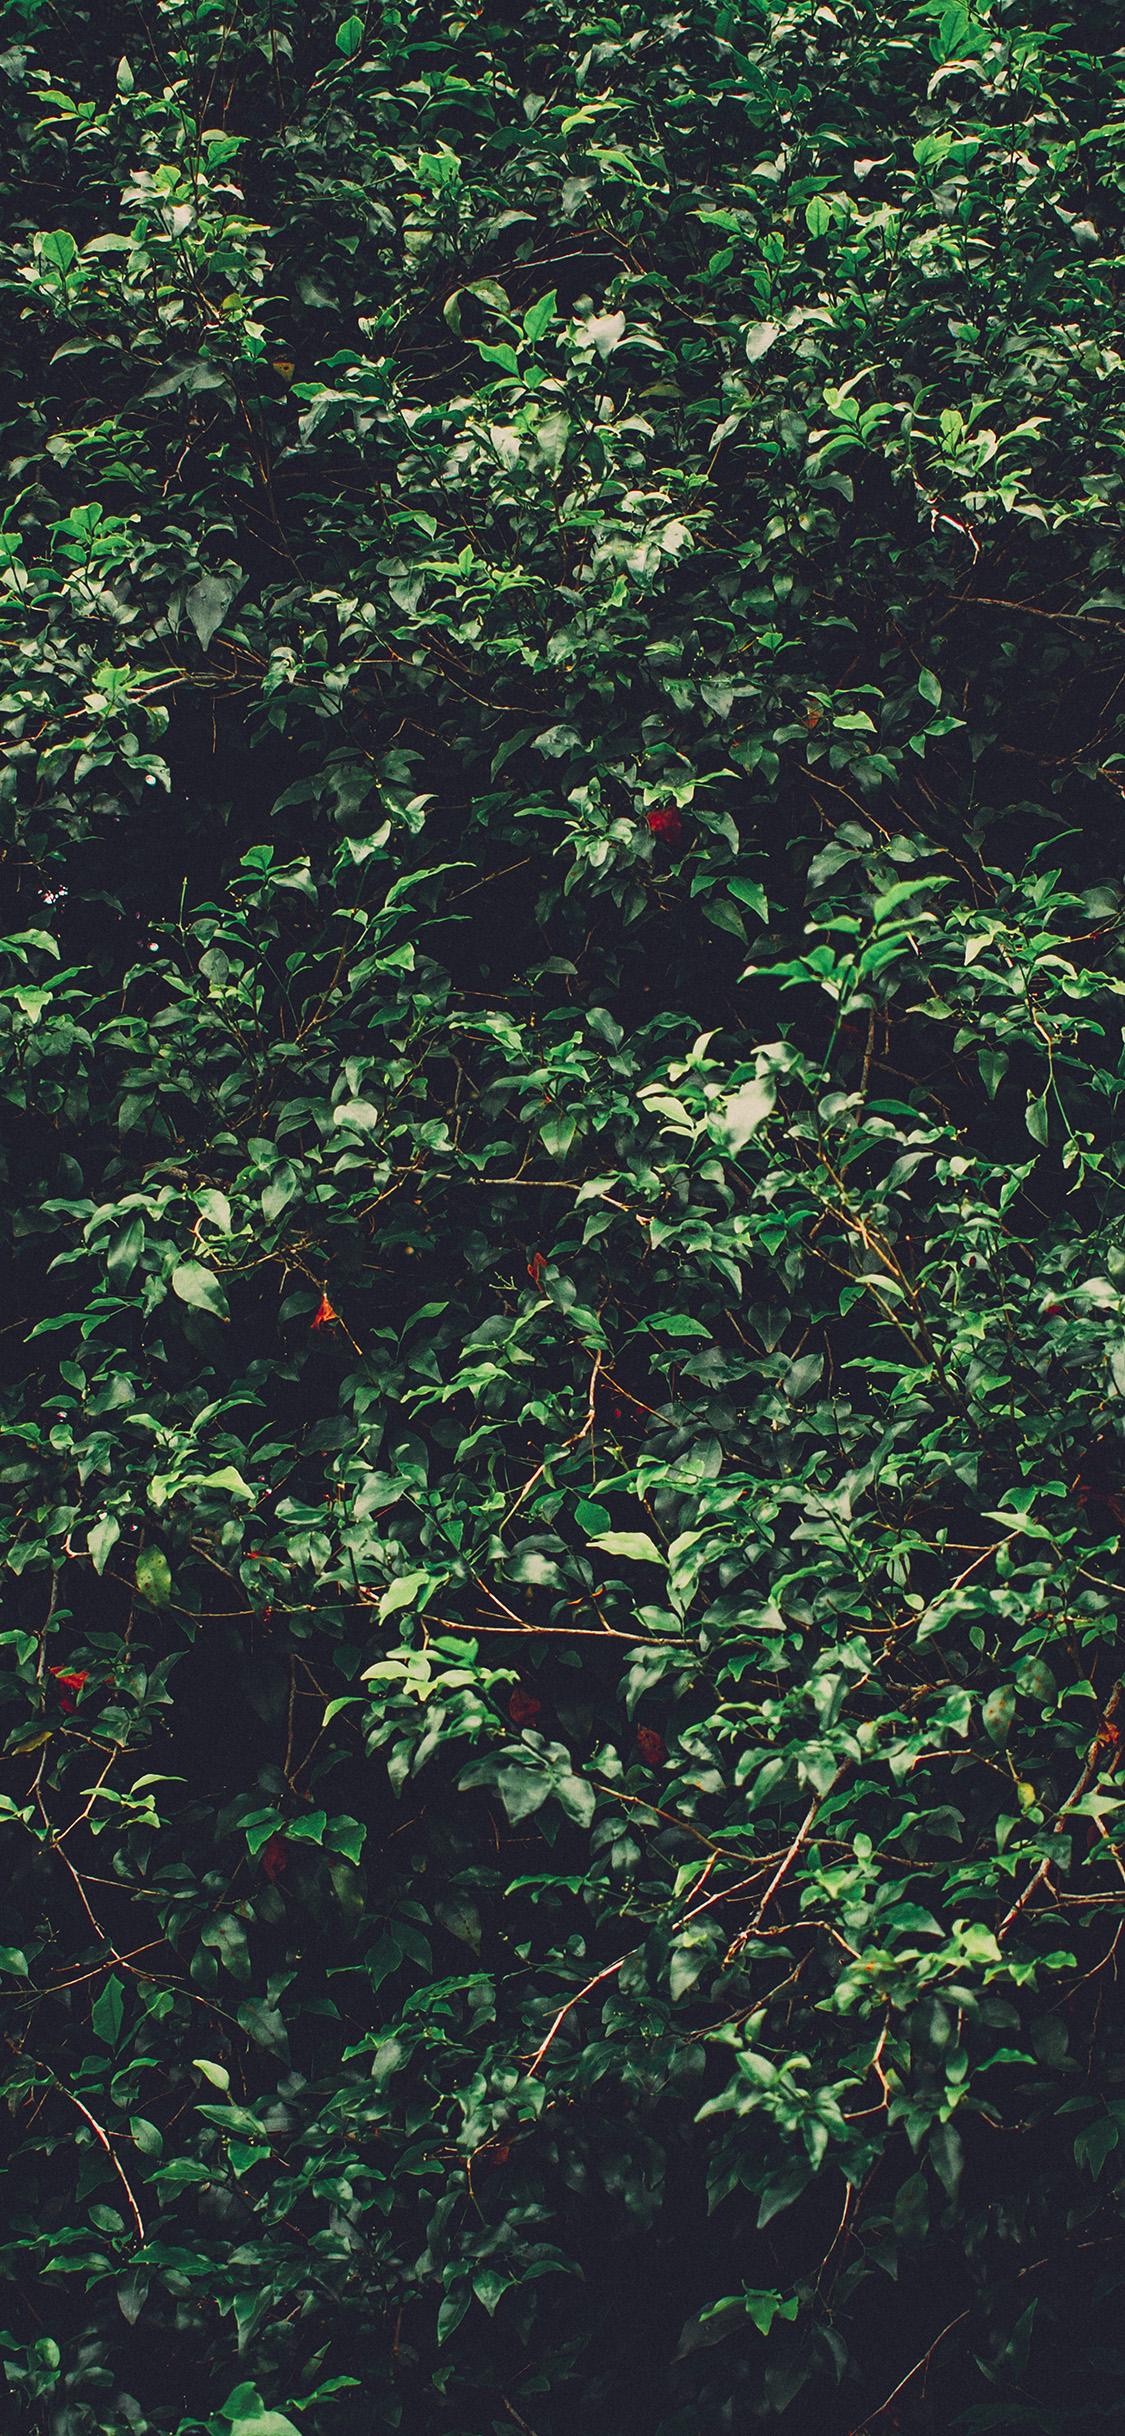 iPhonexpapers.com-Apple-iPhone-wallpaper-oa95-tree-leaf-green-summer-nature